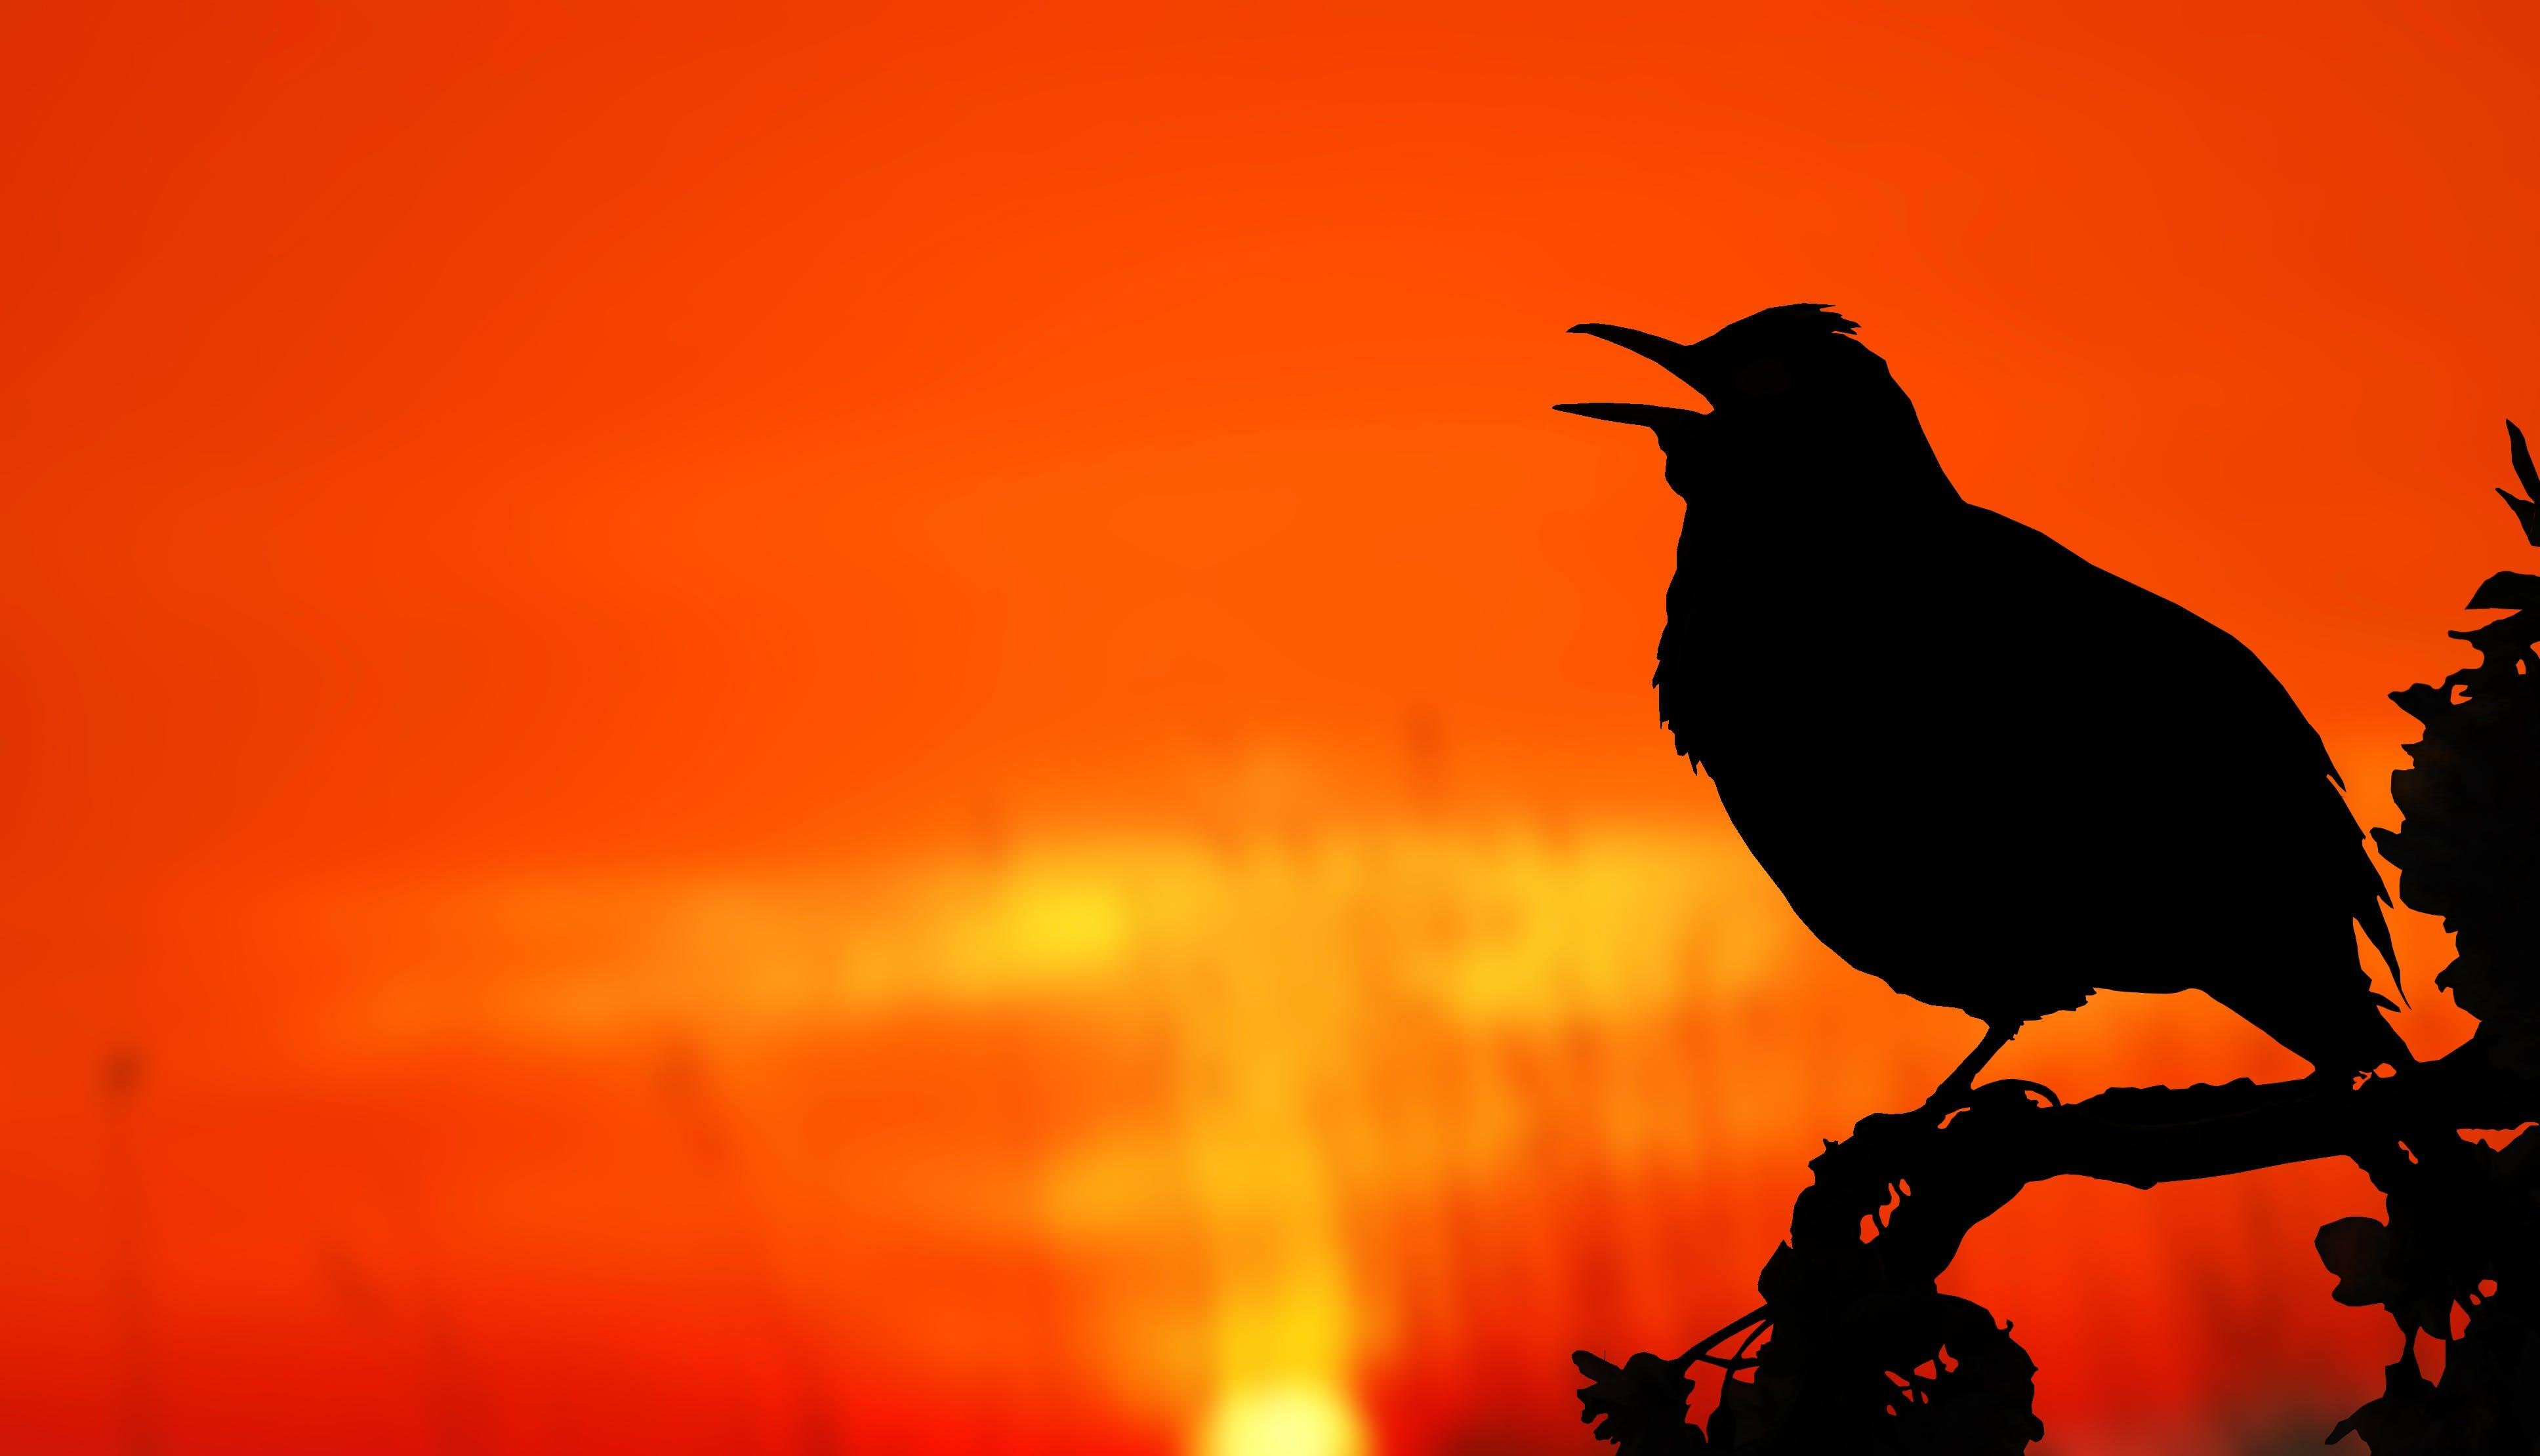 Close-up of Silhouette Bird Perching on Orange Sunset